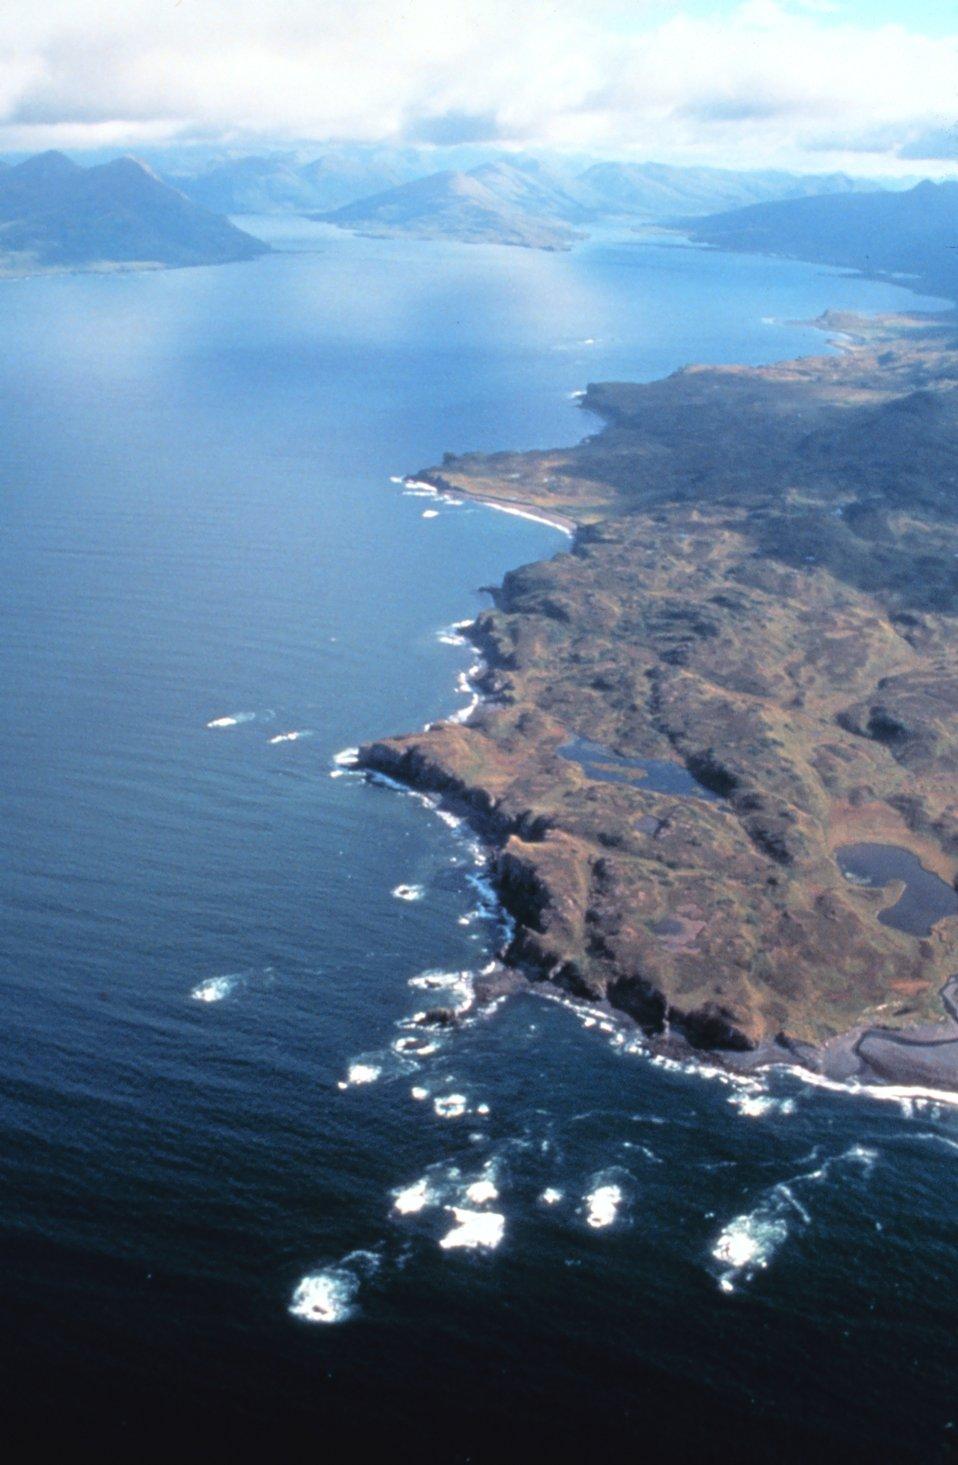 Rugged coastline of Prince William Sound area